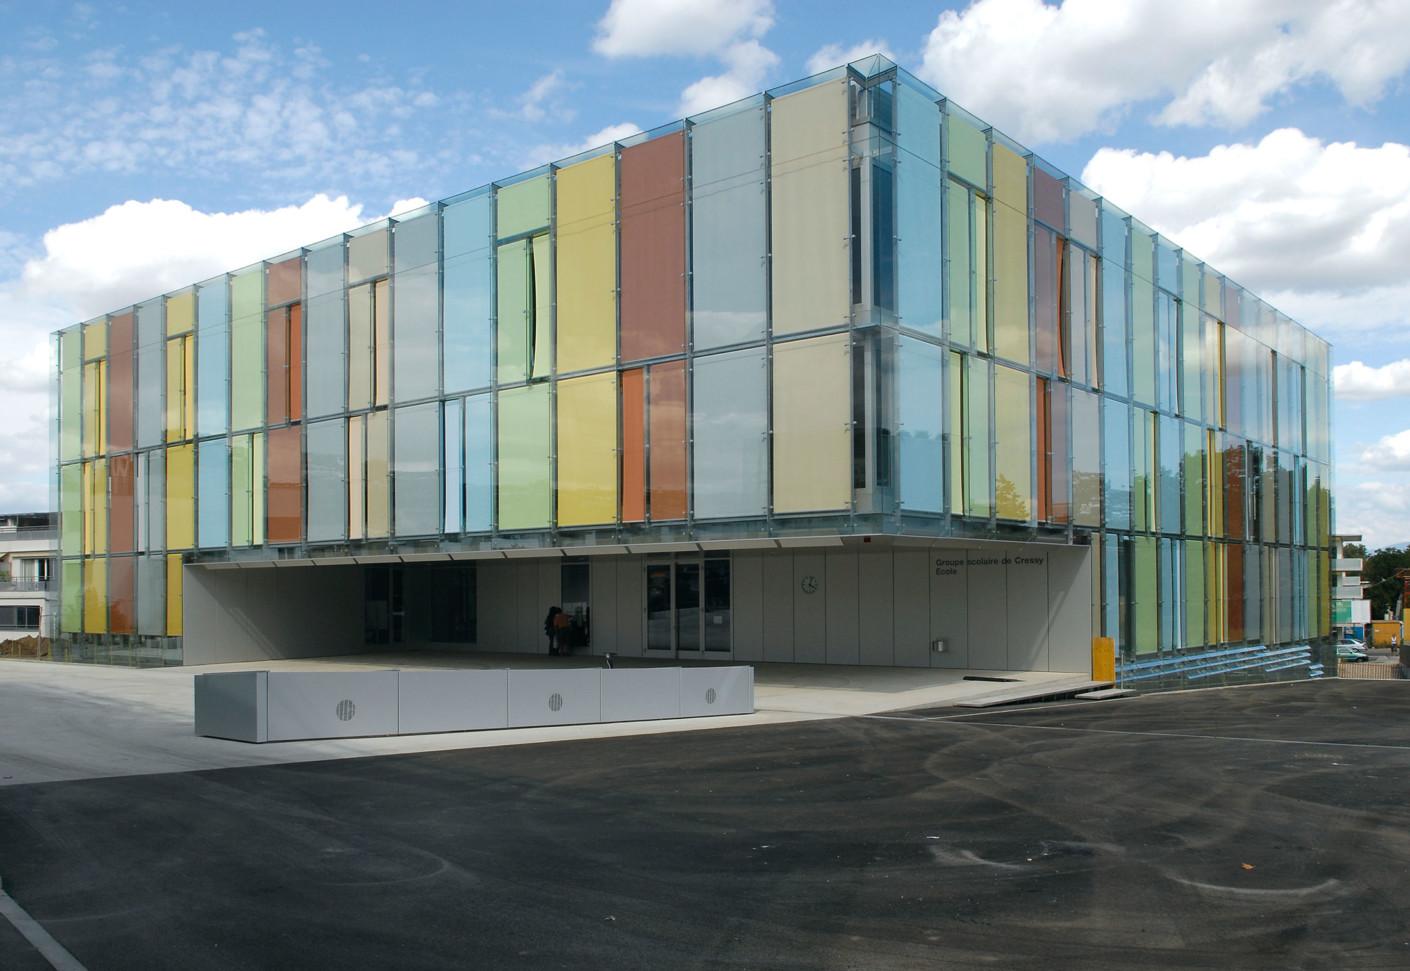 Soltis 92 Cressy School Geneve Switzerland by Serge